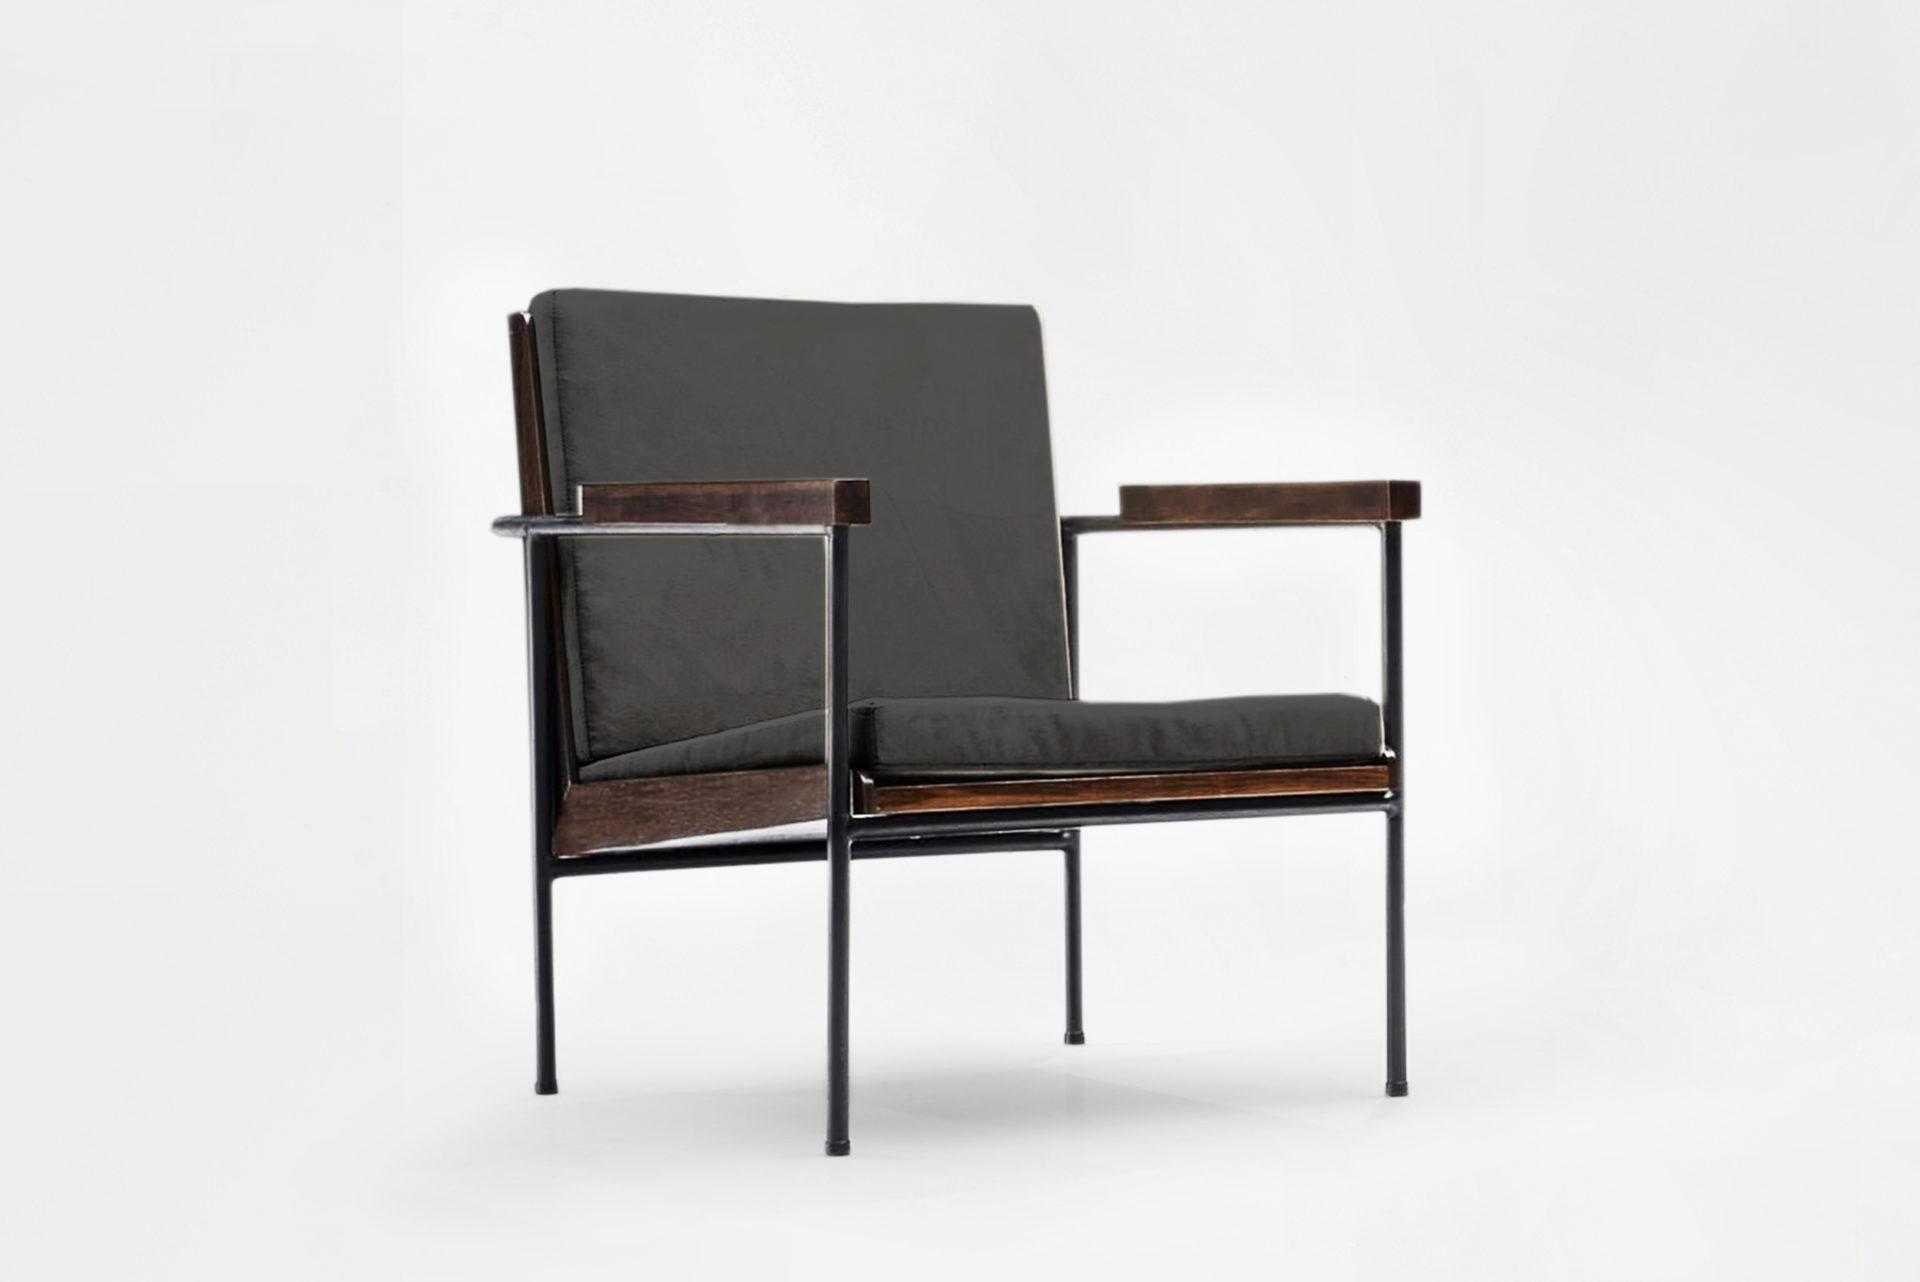 Pair of armchairs Manufactured by Unilabor Brasil, 1955 Iron, jacaranda, upholstery